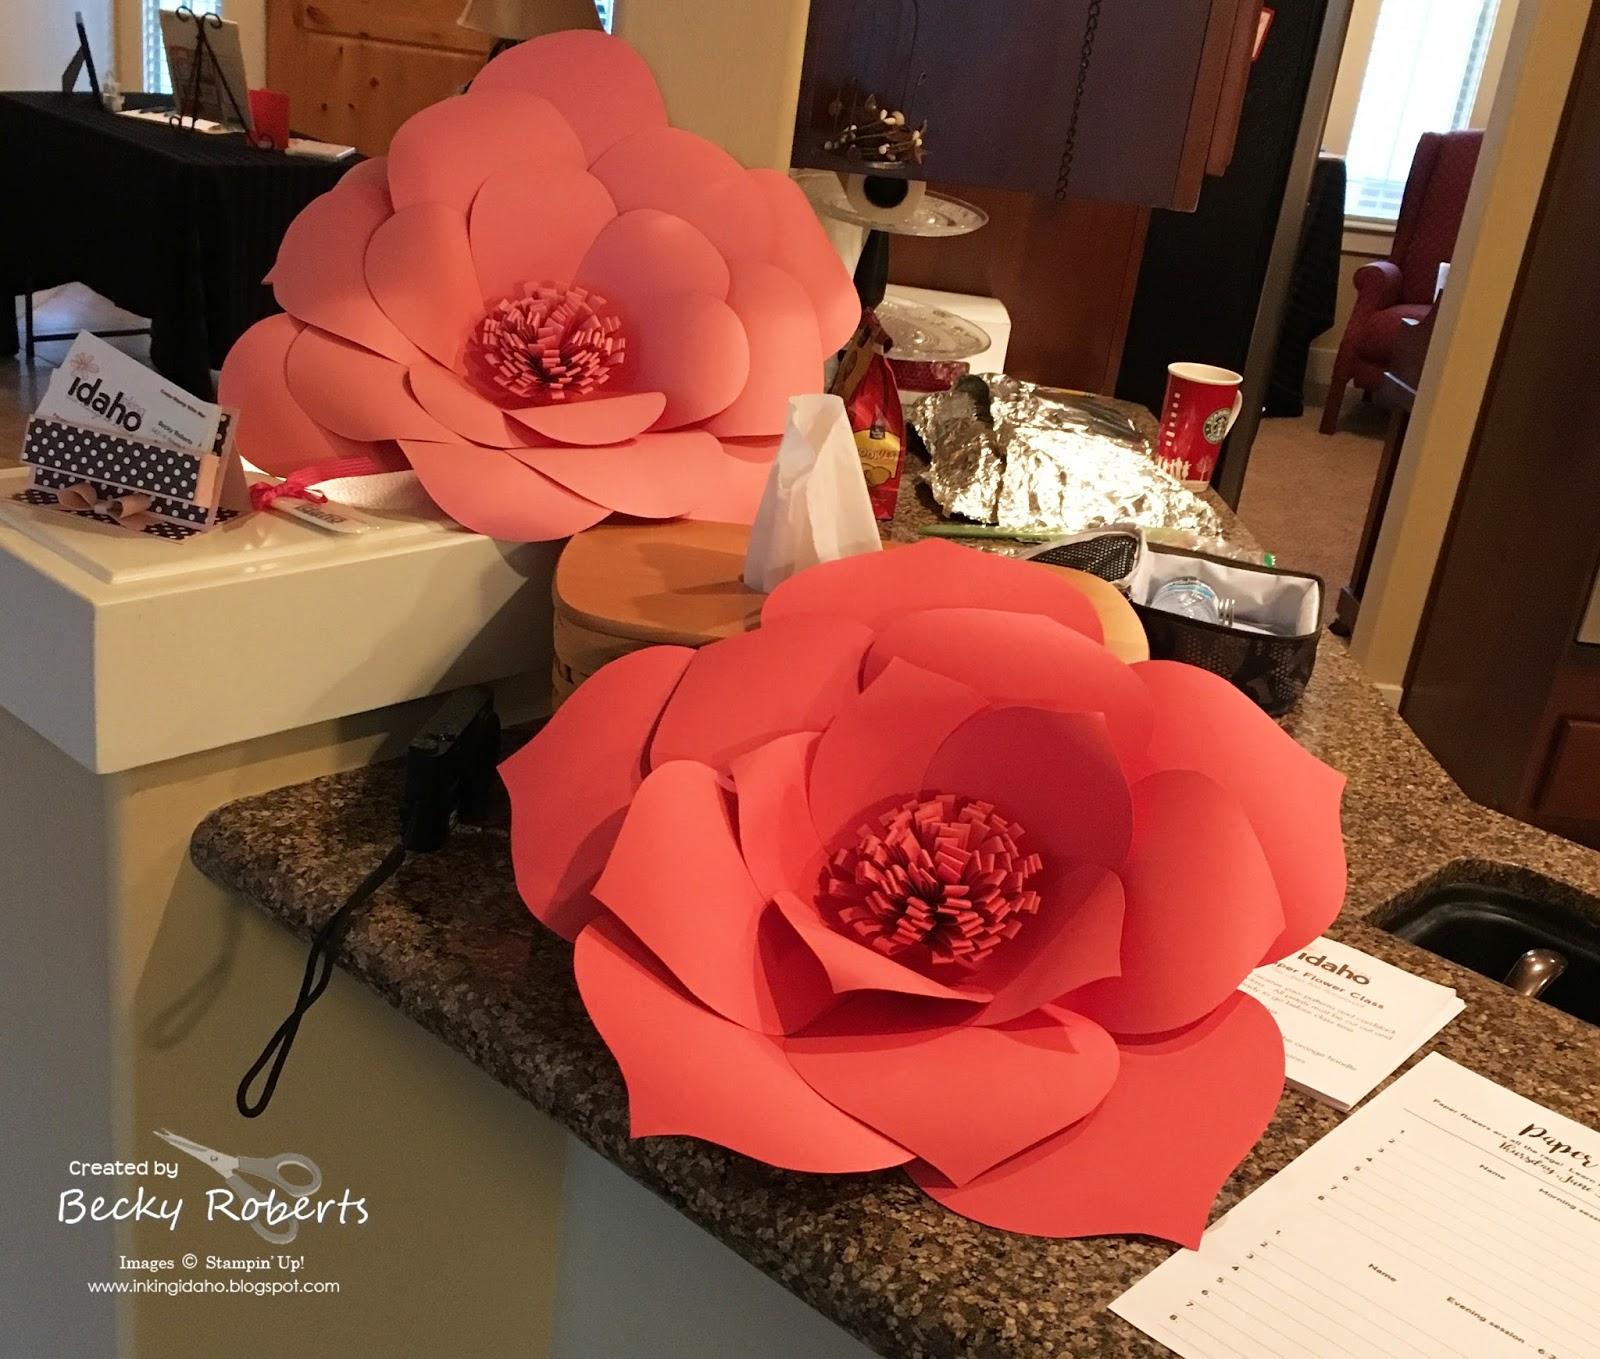 Inking Idaho: Open House & Rubber Garage Sale Part 3